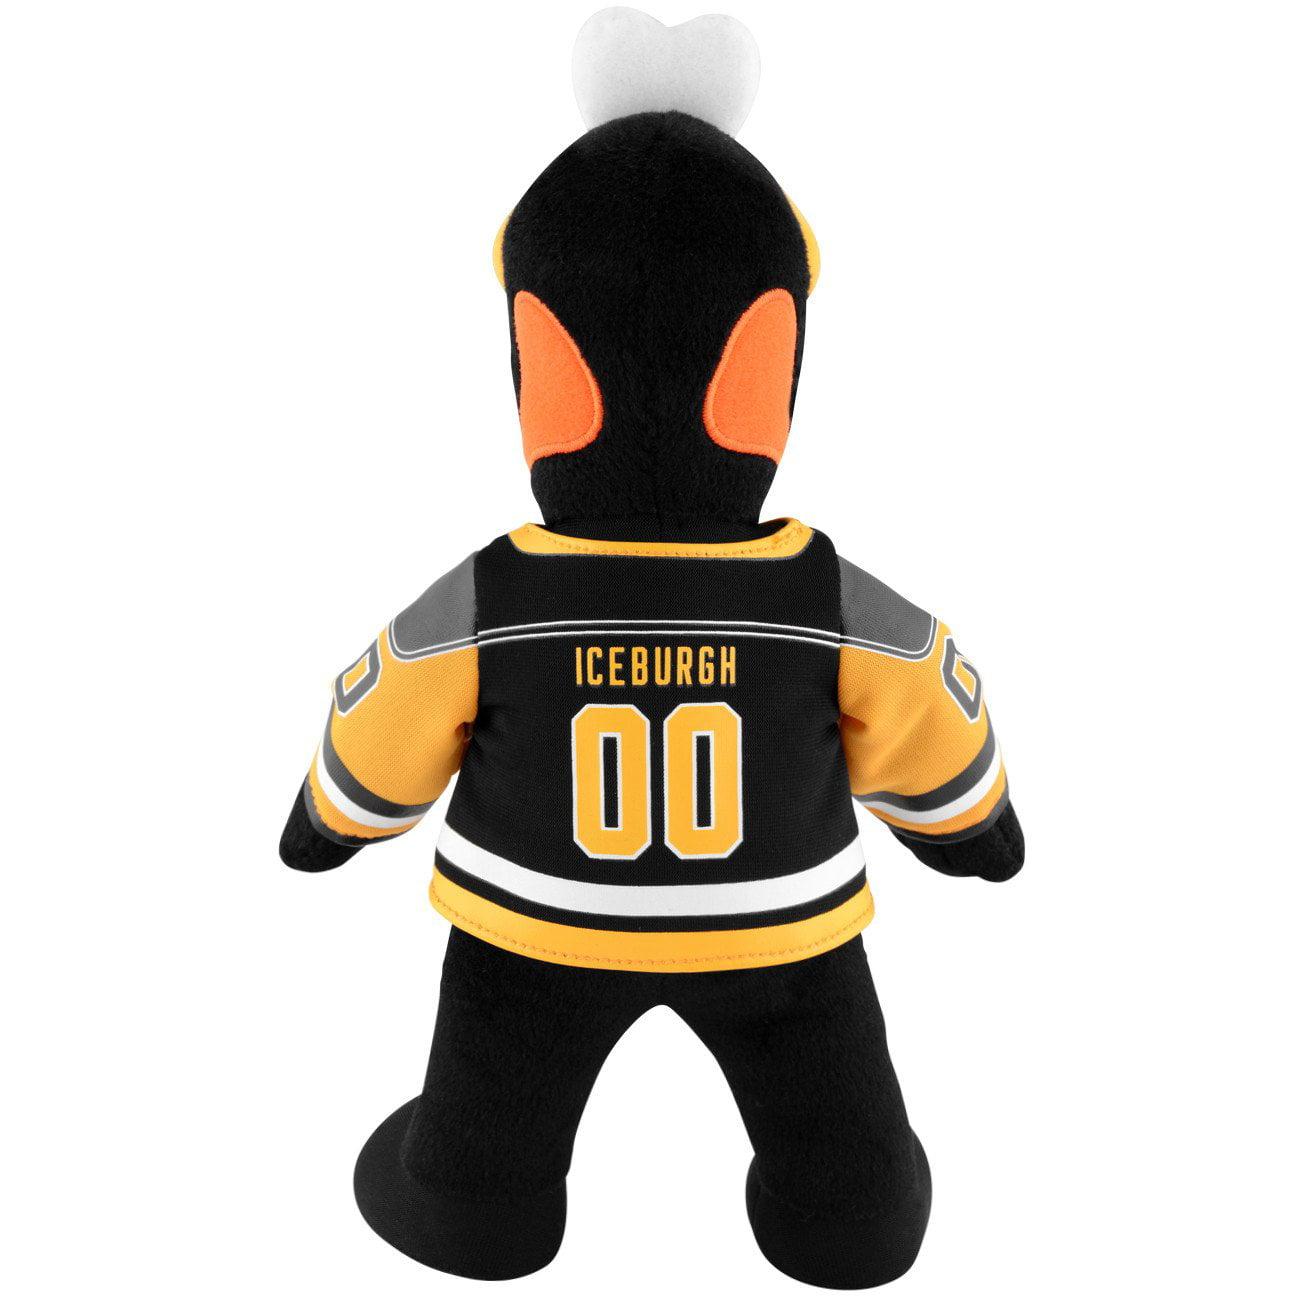 Pittsburgh Penguins Iceburgh 10 Plush Mascot Walmart Com